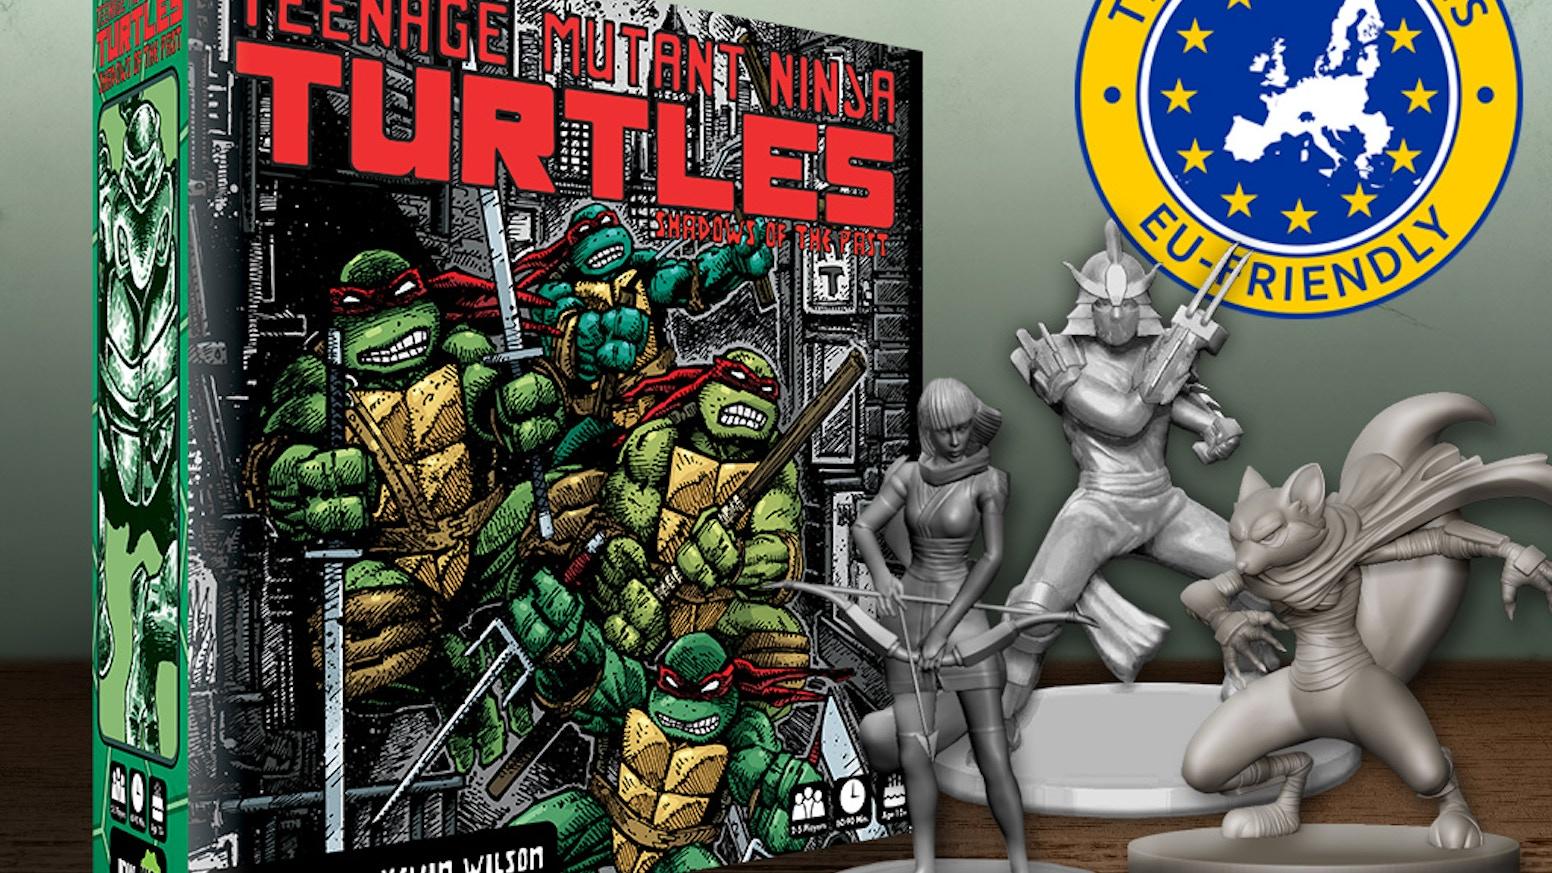 Teenage Mutant Ninja Turtles Shadows Of The Past Board Game By Idw Games Kickstarter